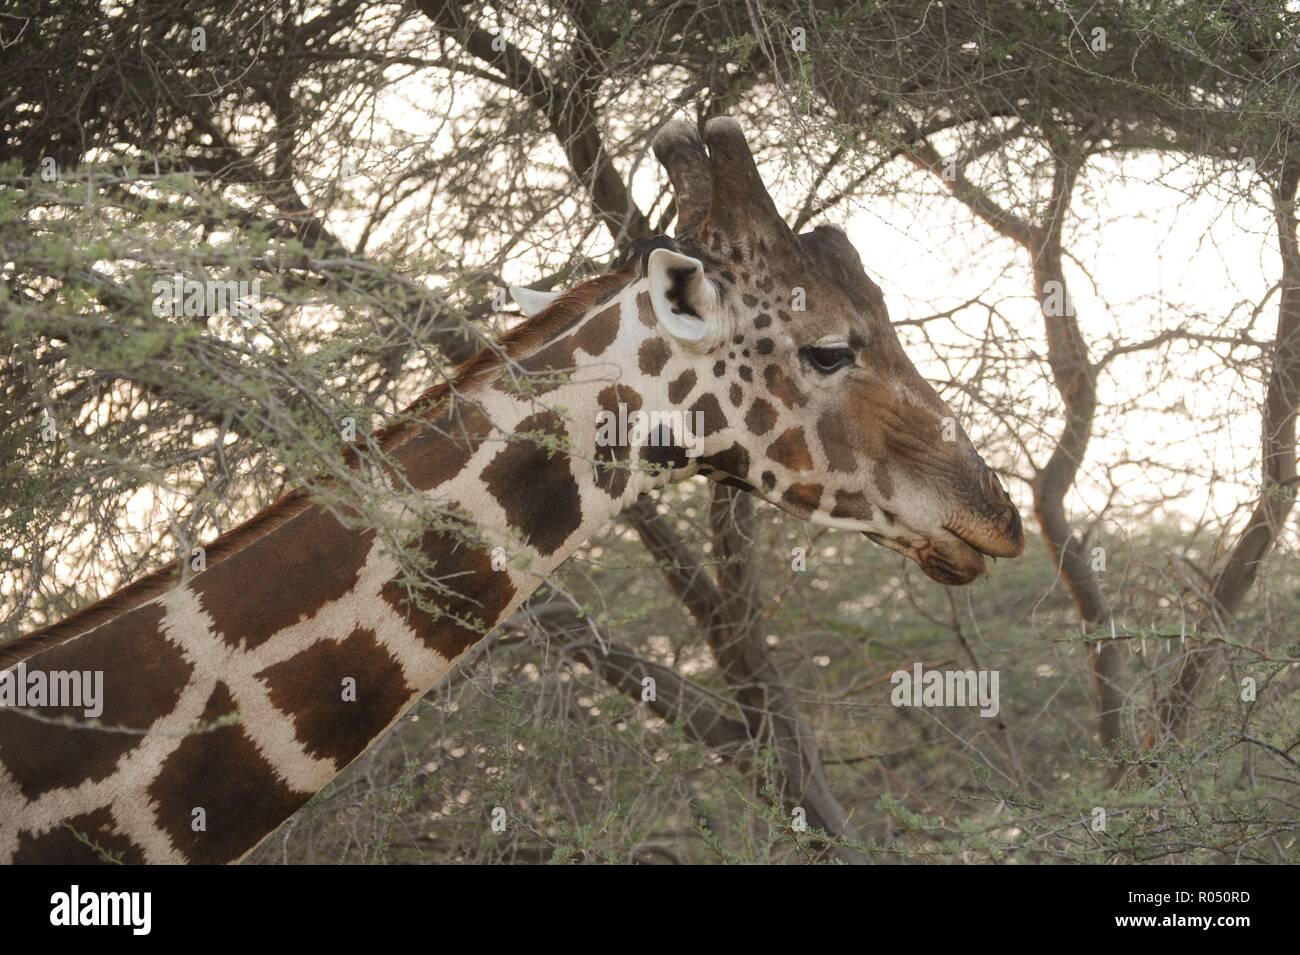 17 October 2018, United Arab Emirates, Sir Bani Yas: A net giraffe on the island of Sir Bani Yas. A reticulated giraffe on the island of Sir Bani Yas. Photo: Sebastian Kahnert/dpa-Zentralbild/ZB - Stock Image